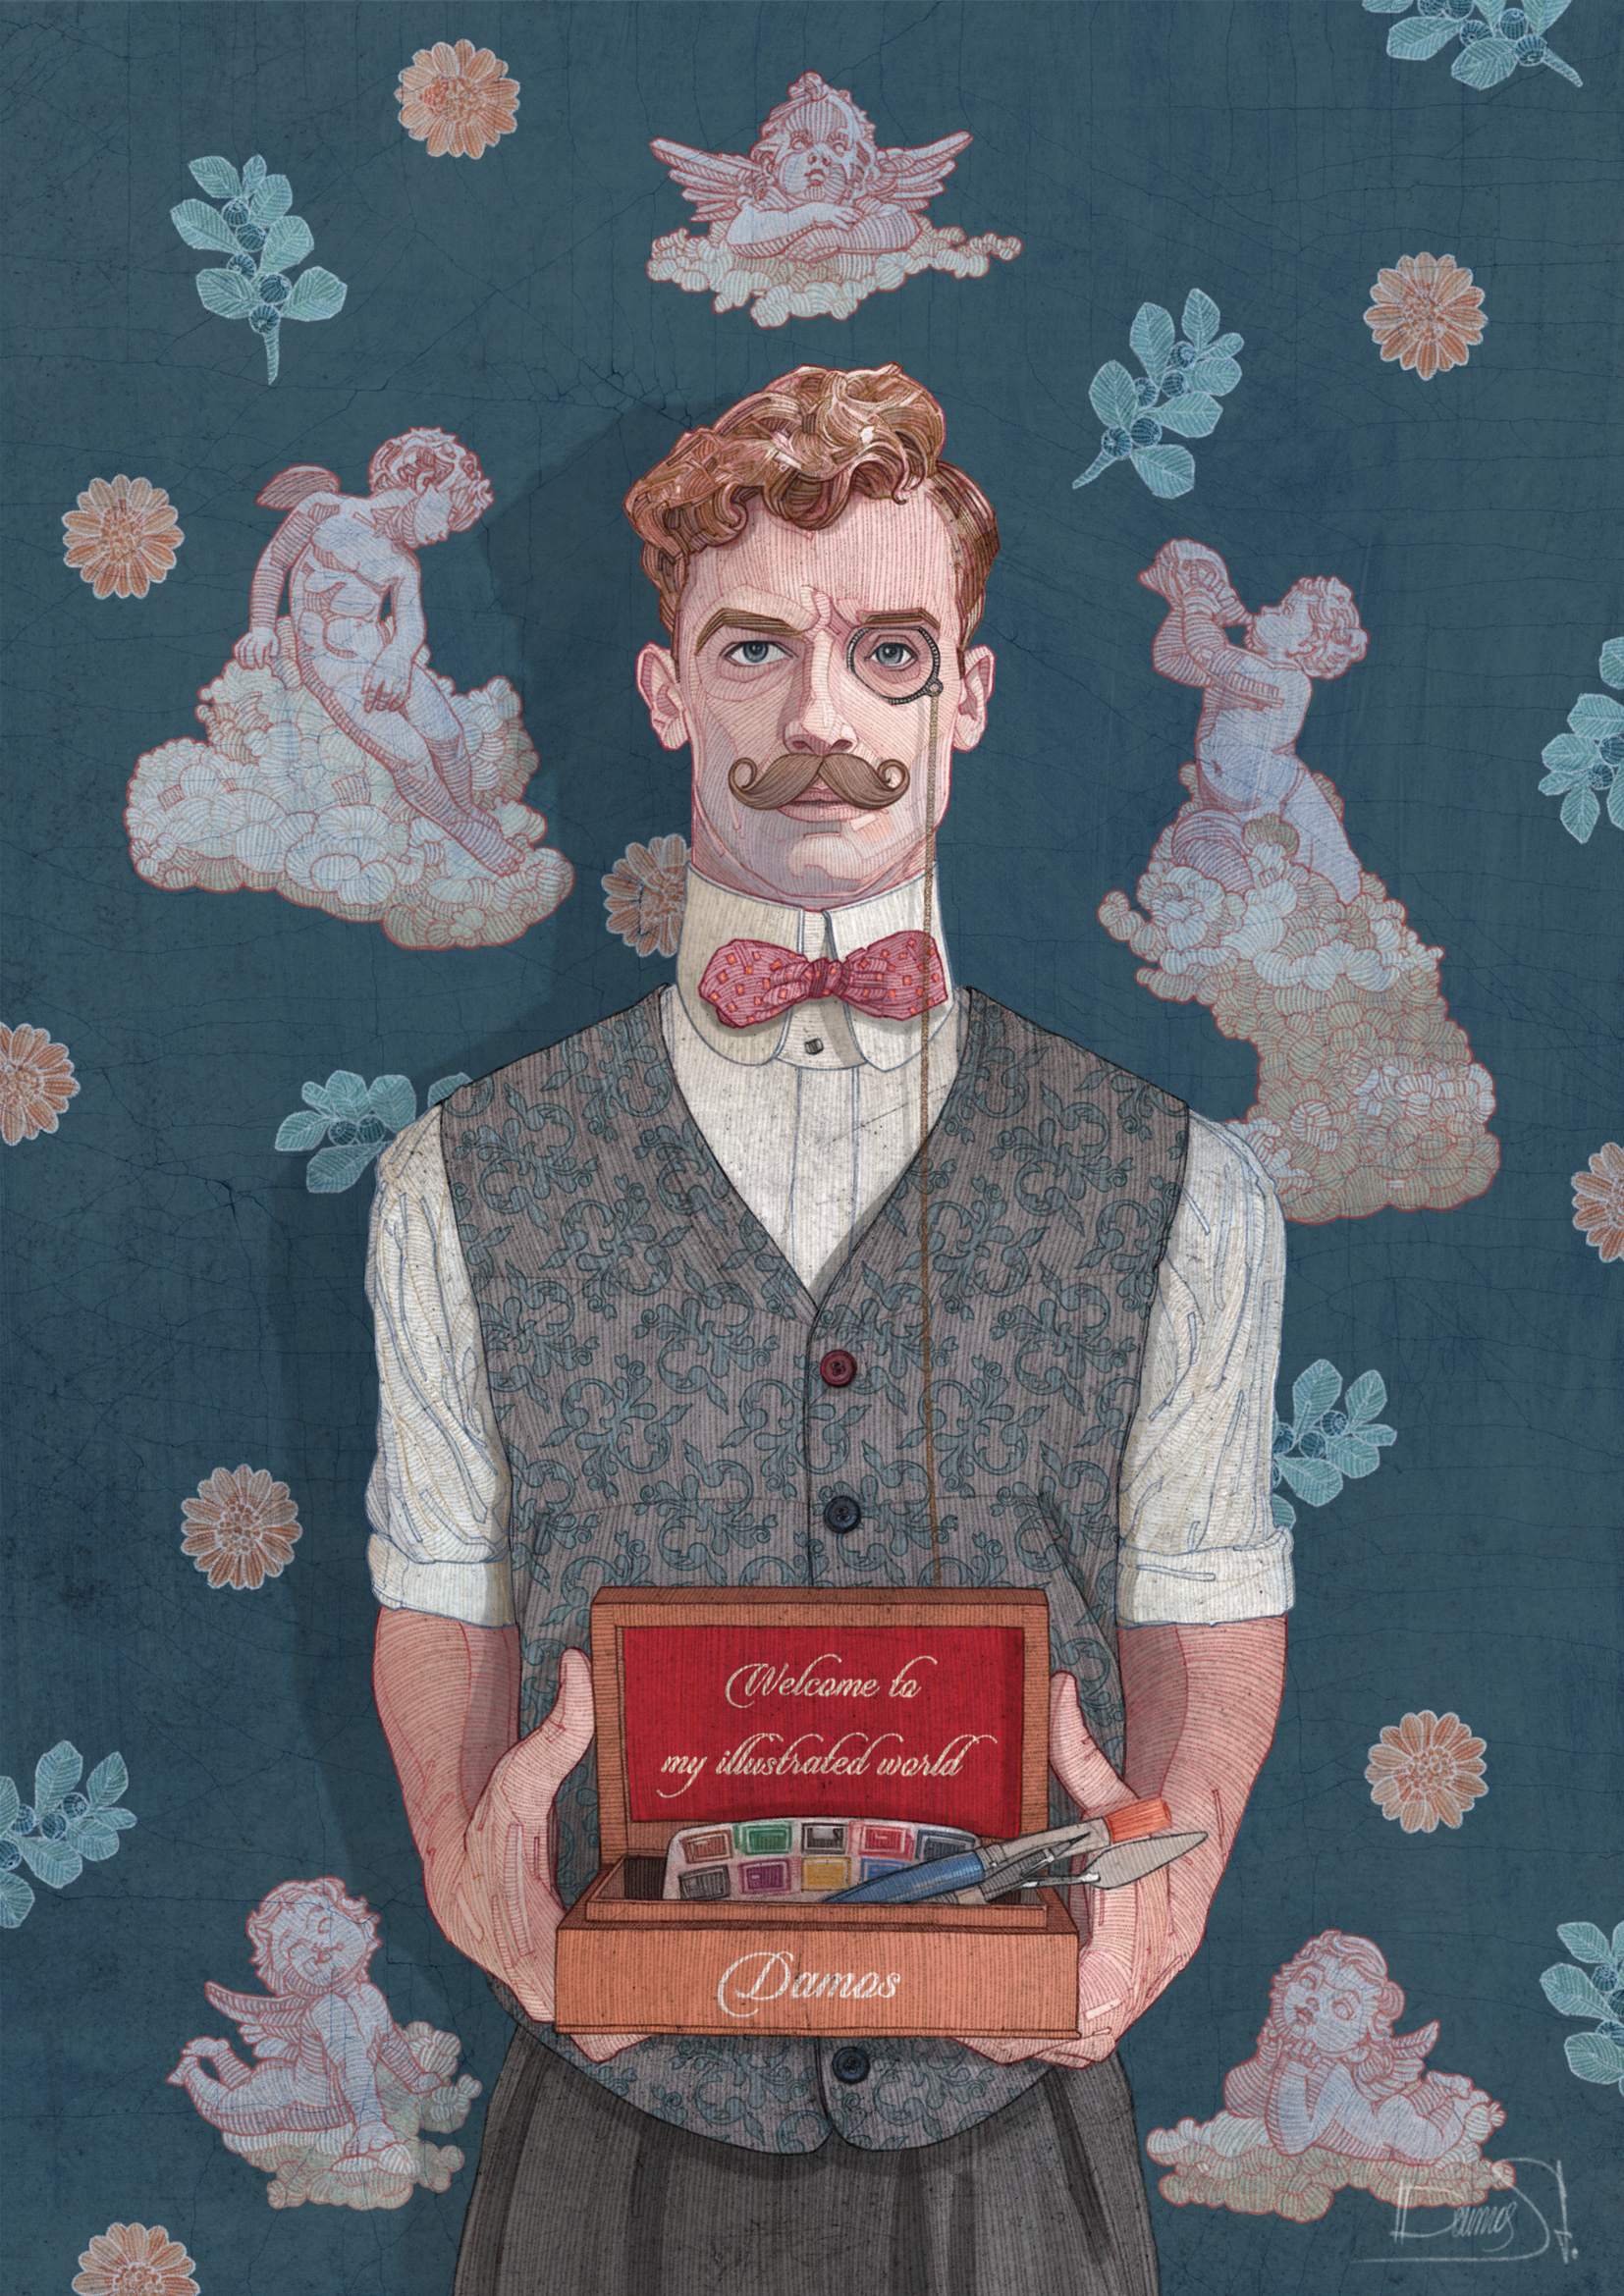 vintage inspired art man character